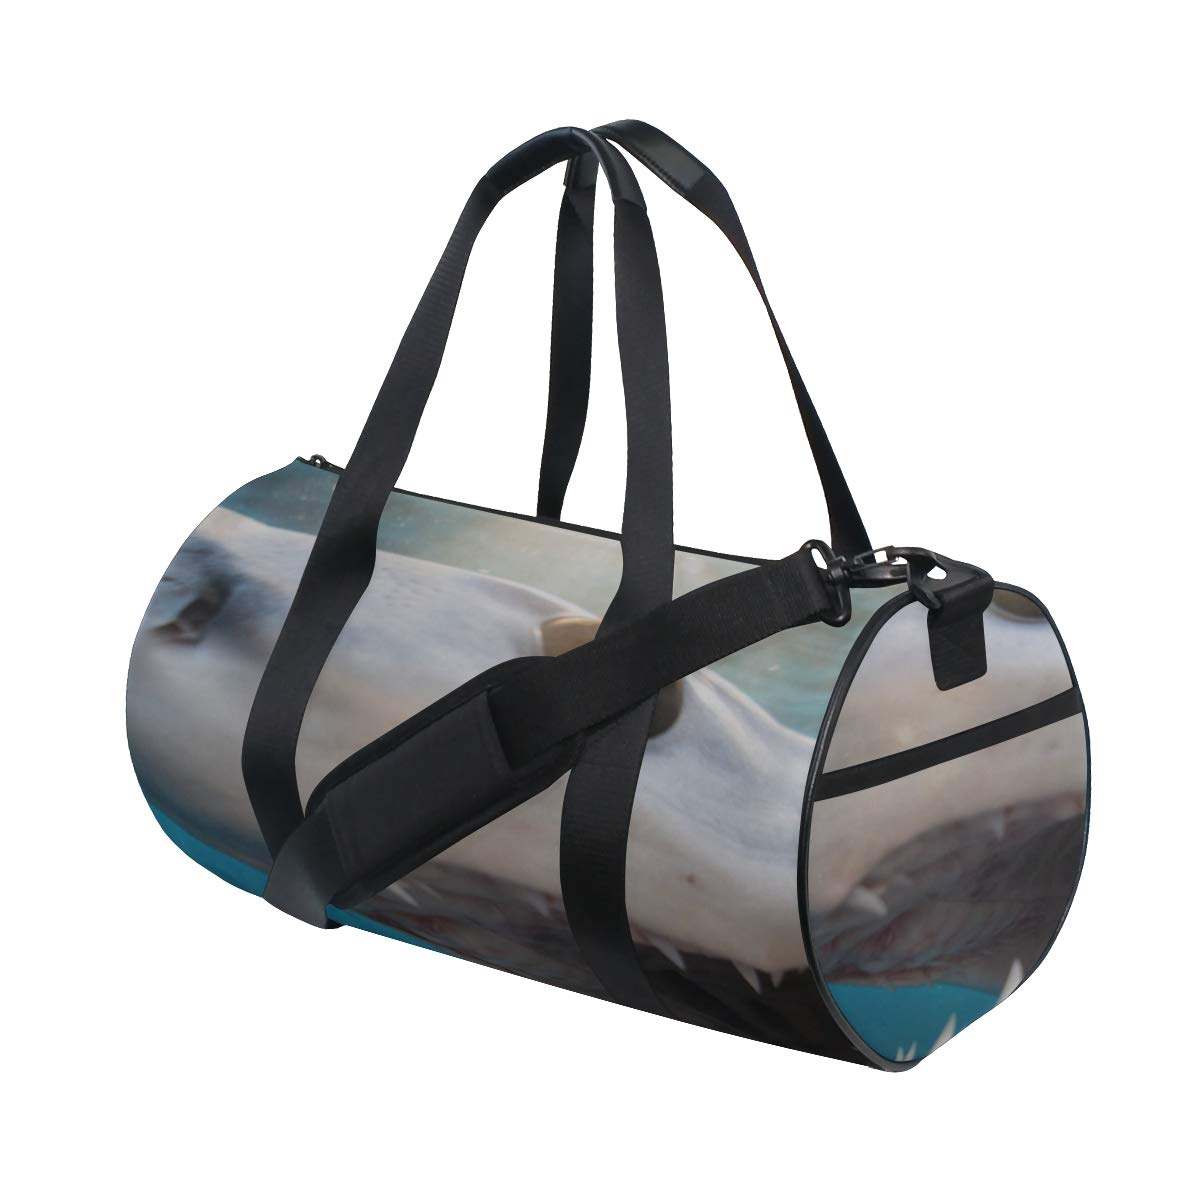 Fierce Awful Shark Custom Multi Lightweight Large Yoga Gym Totes Handbag Travel Canvas Duffel Bags With Shoulder Crossbody Fitness Sport Luggage For Boy Girl Men Women